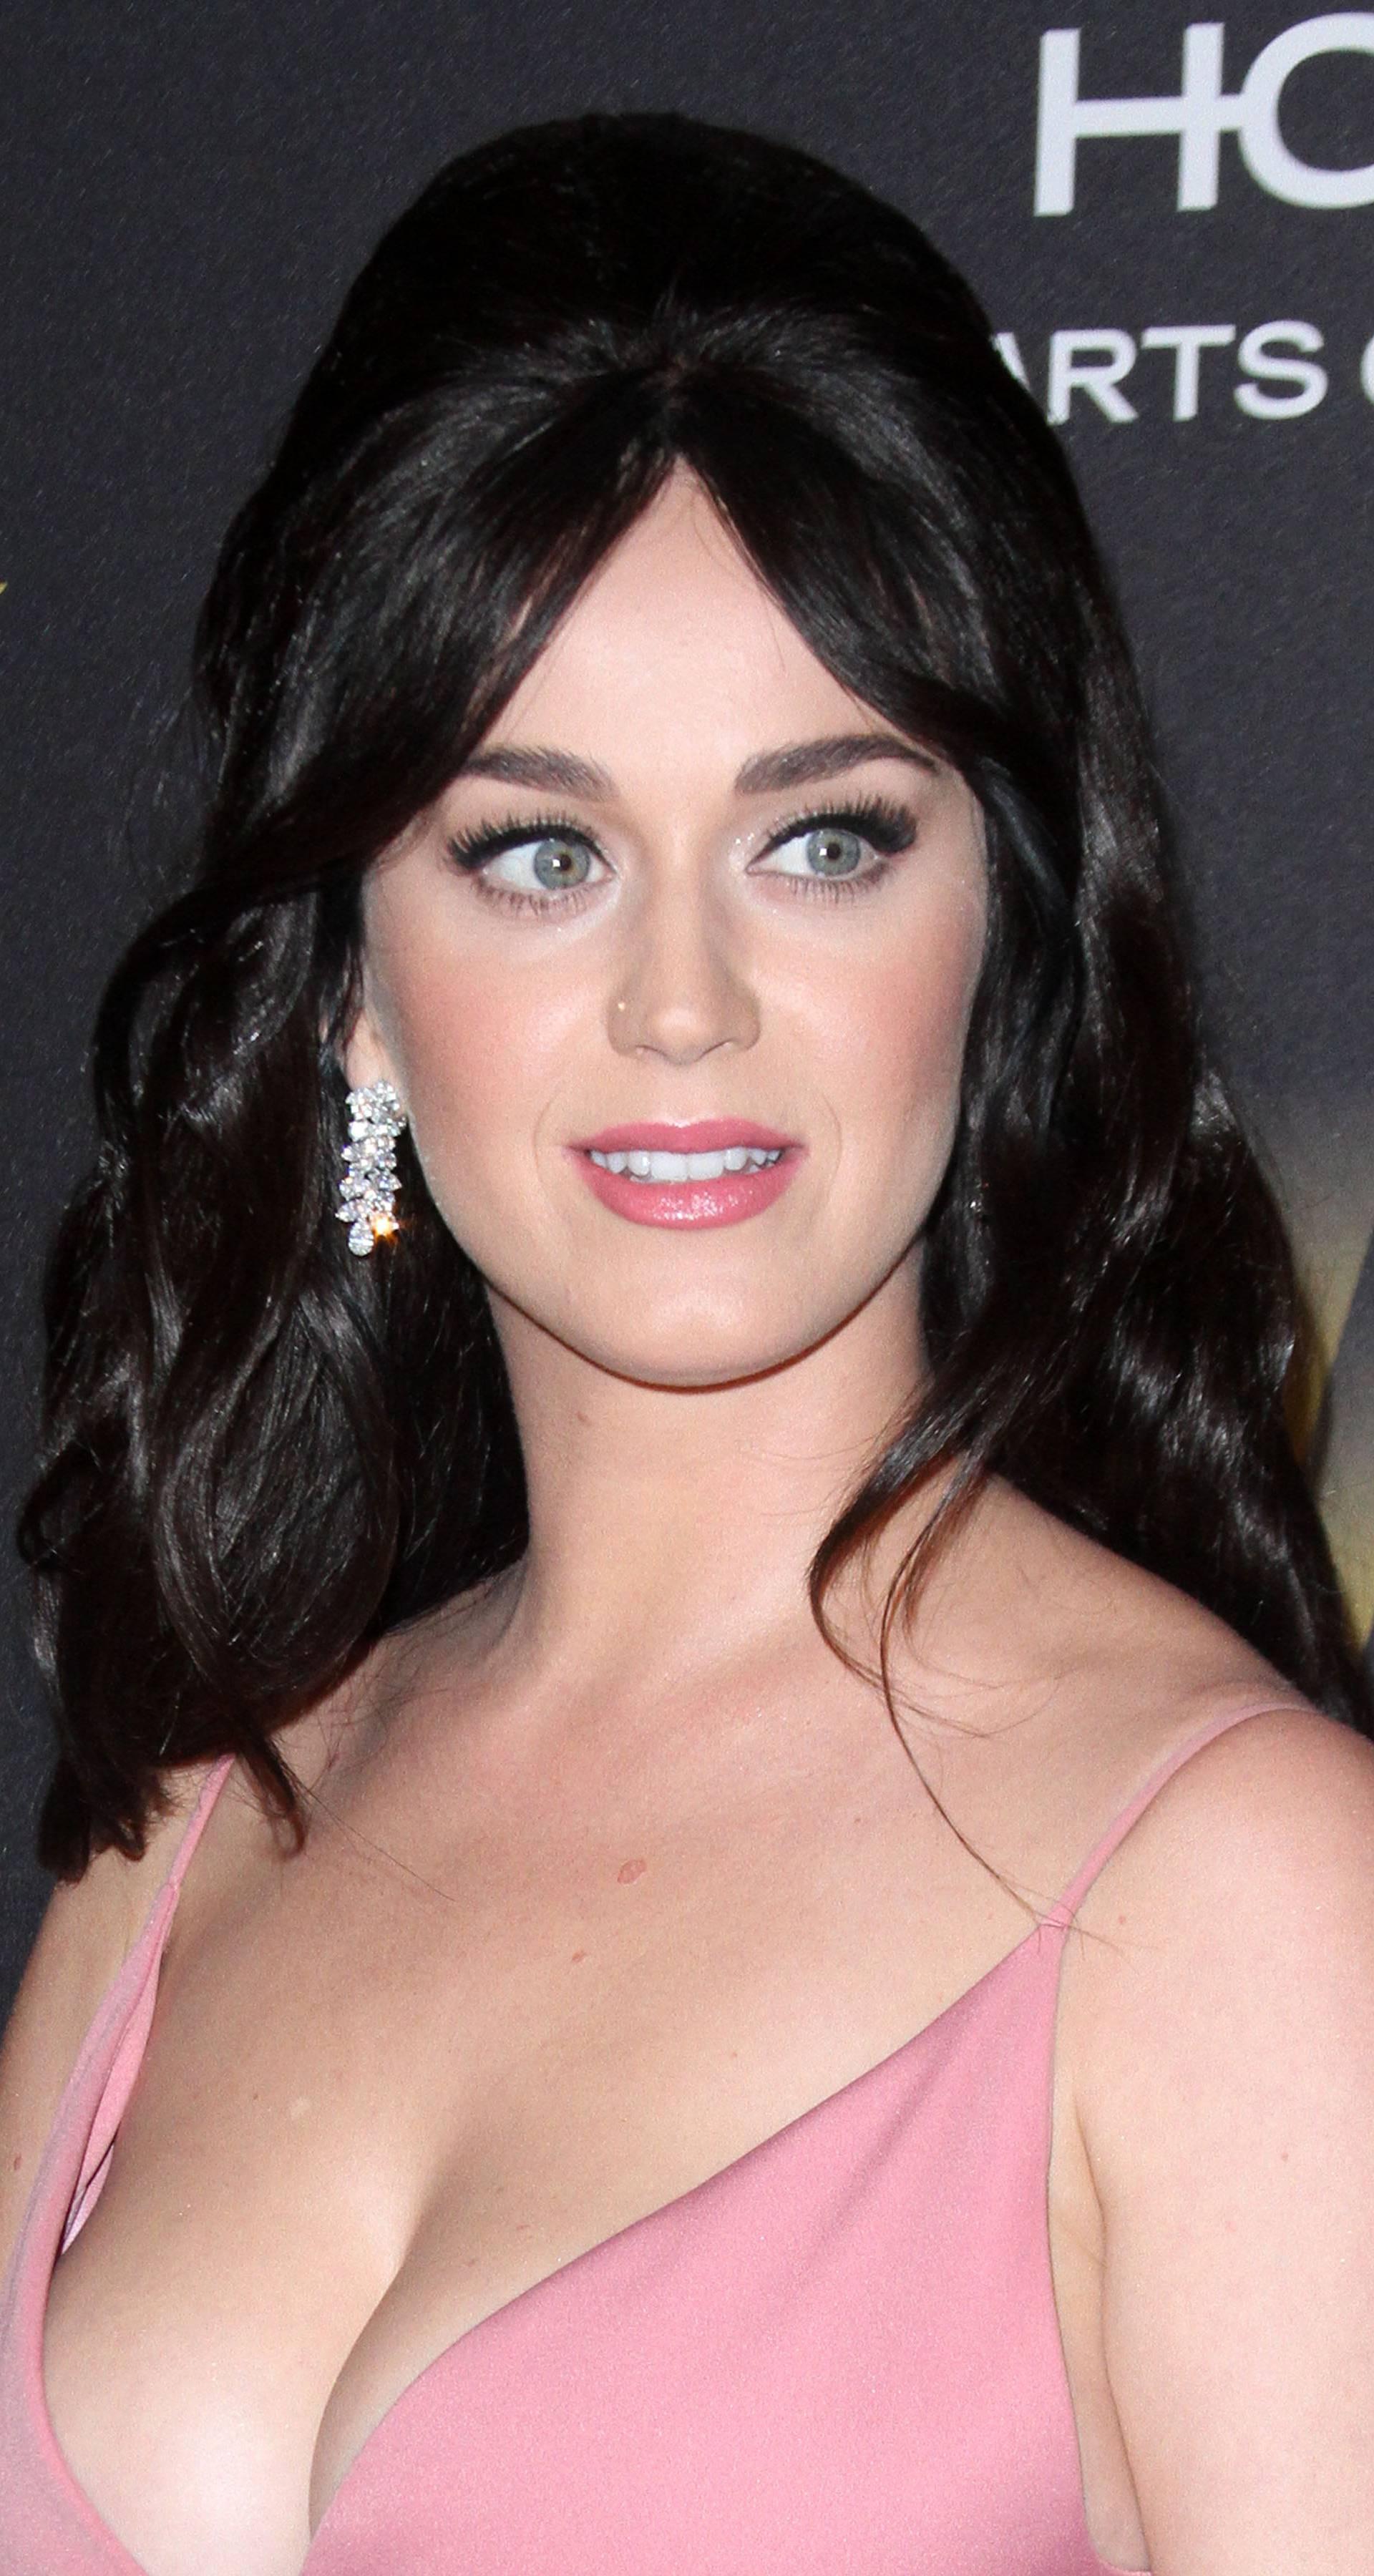 Katy Perry: Moj psihijatar mi pomaže da ostanem normalna